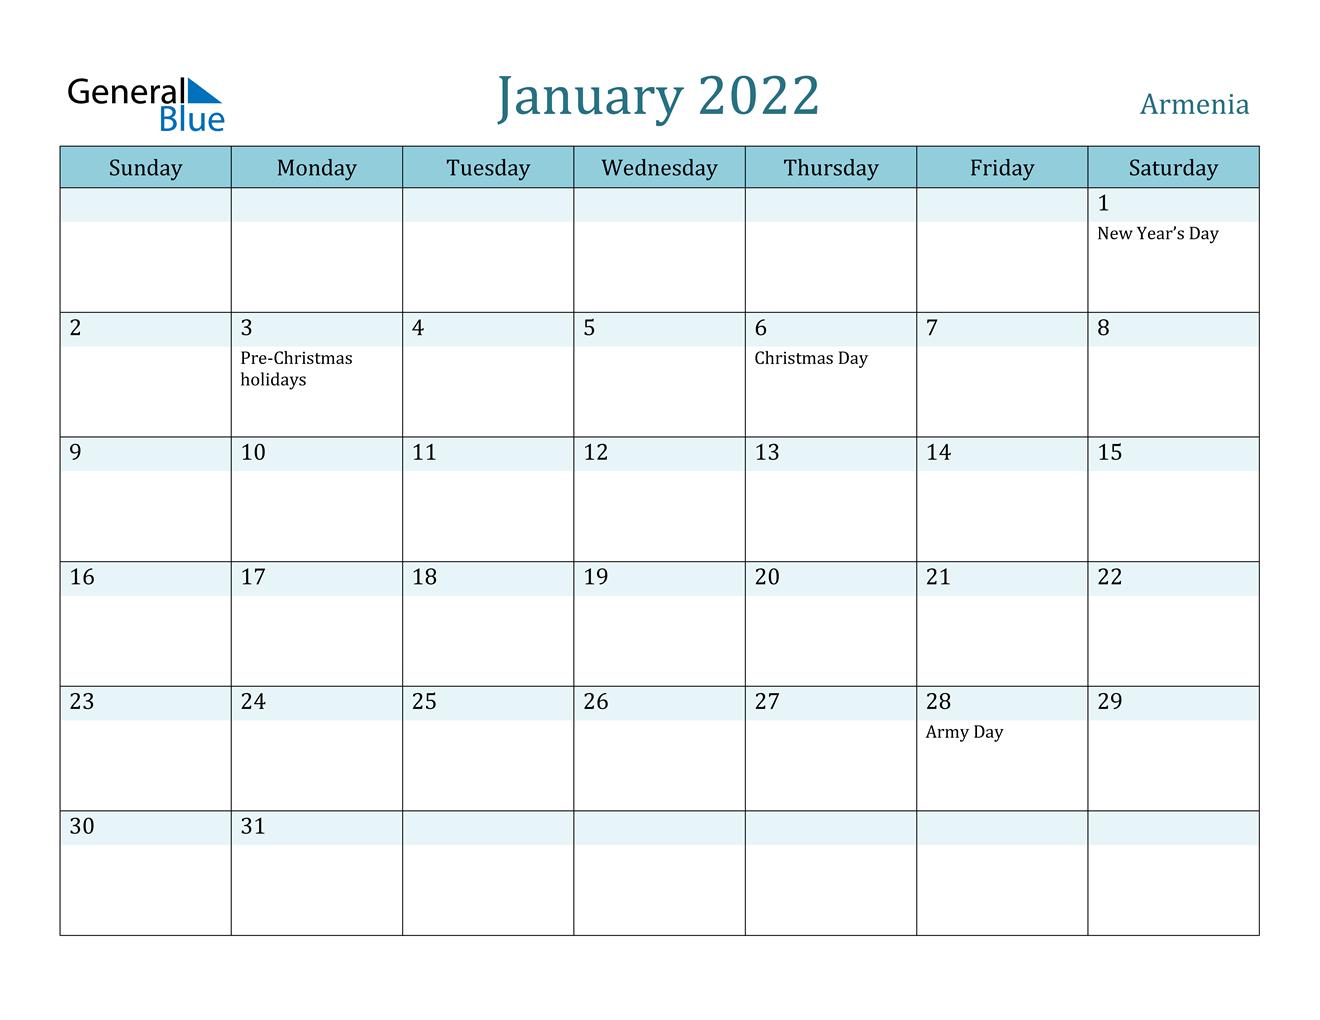 January 2022 Calendar - Armenia